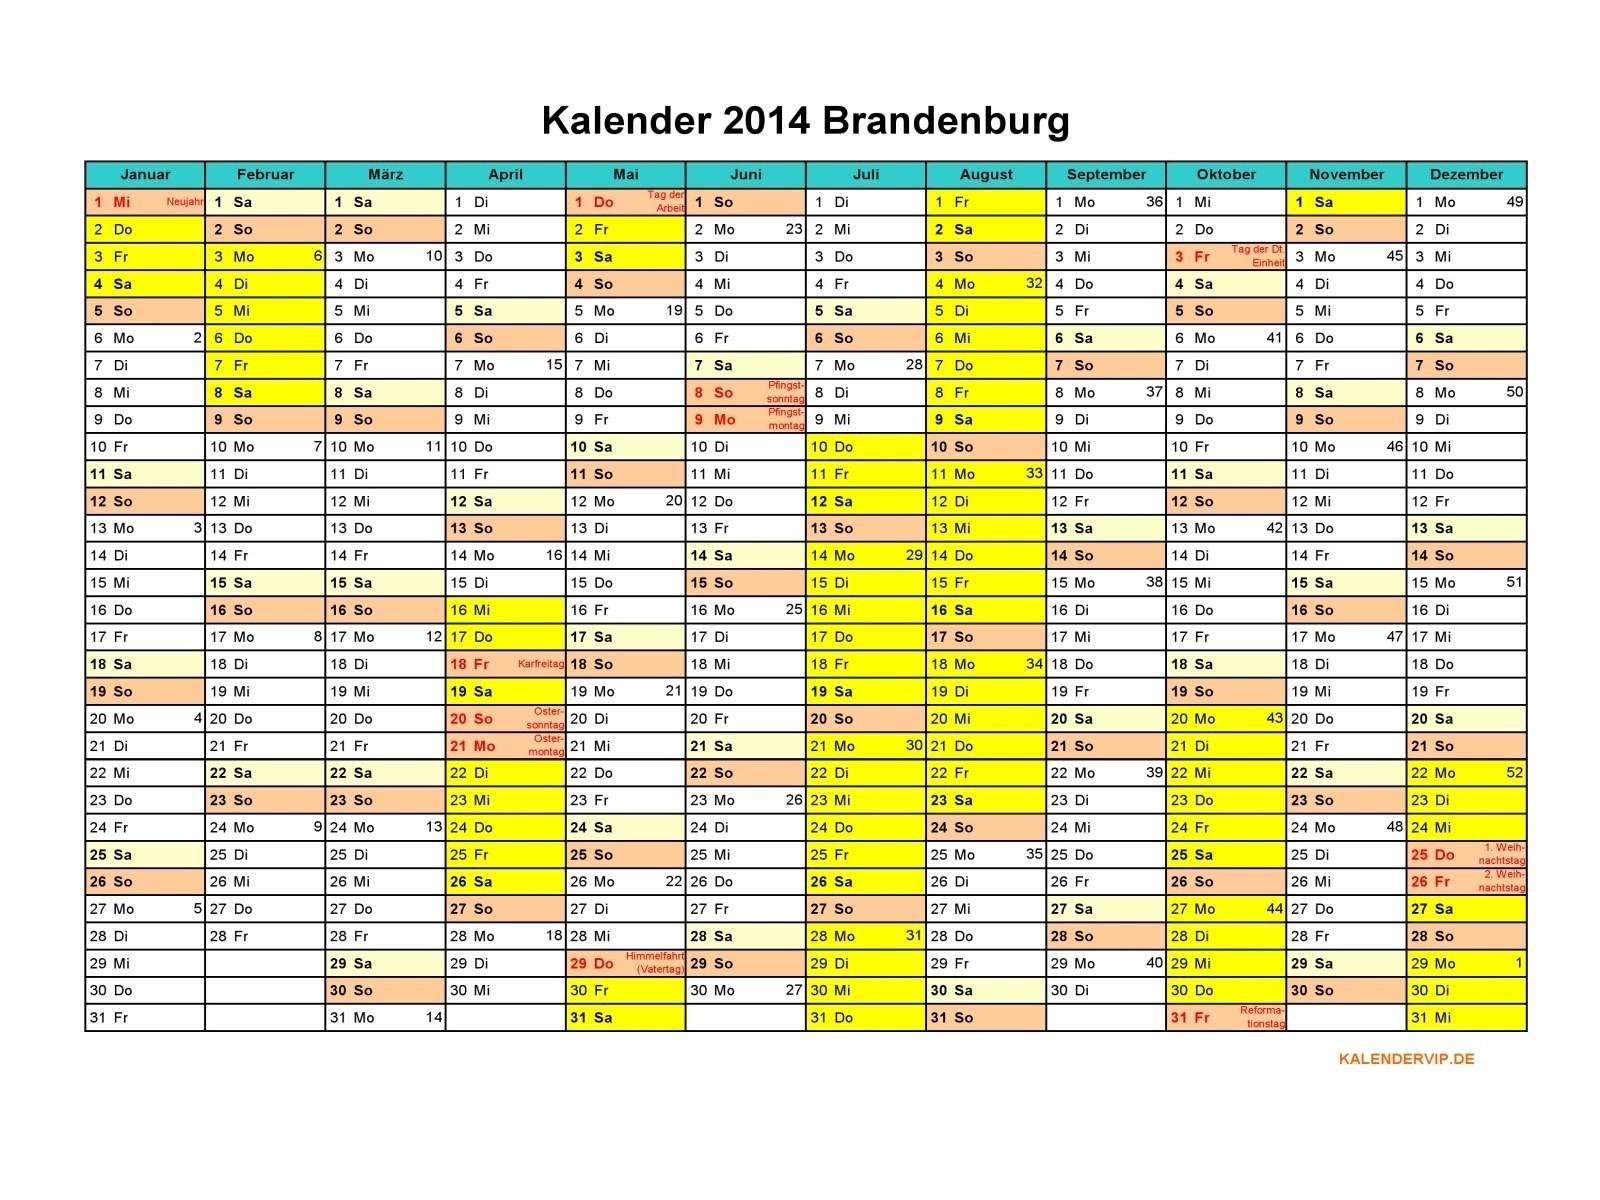 Kalender 2018 Excel Download Kostenlos Source